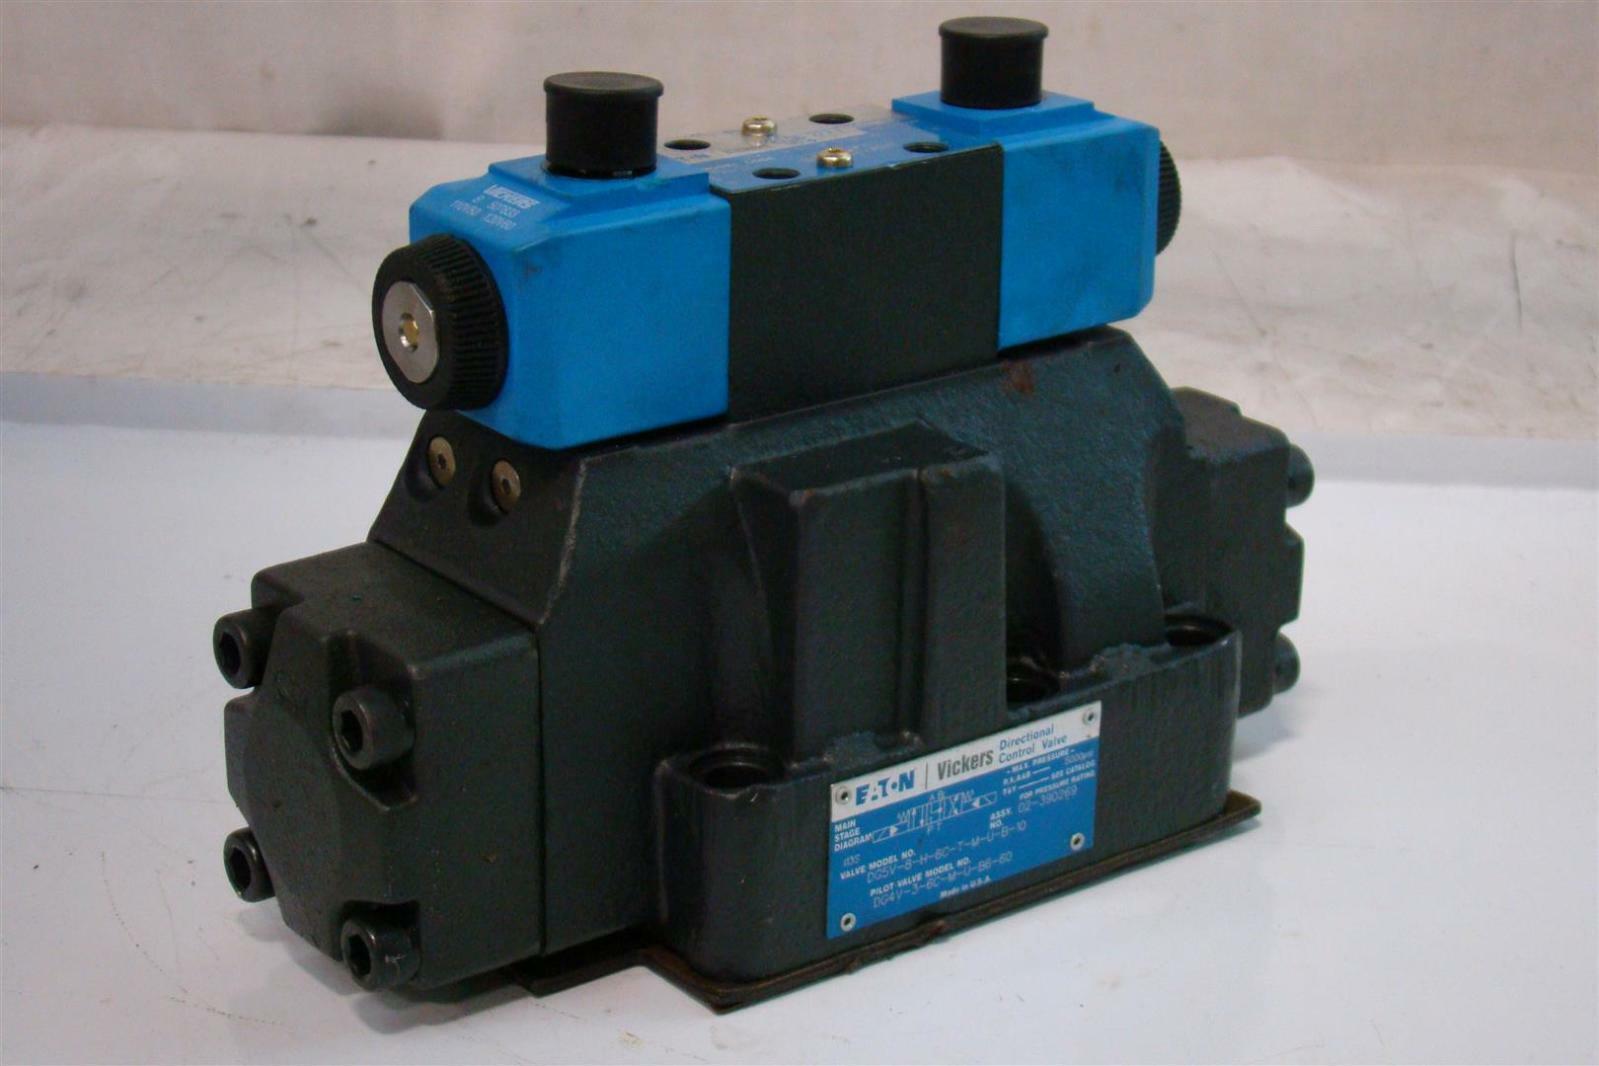 Eaton Vickers Directional Control Valve 5000psi Dg5v 8h 6c